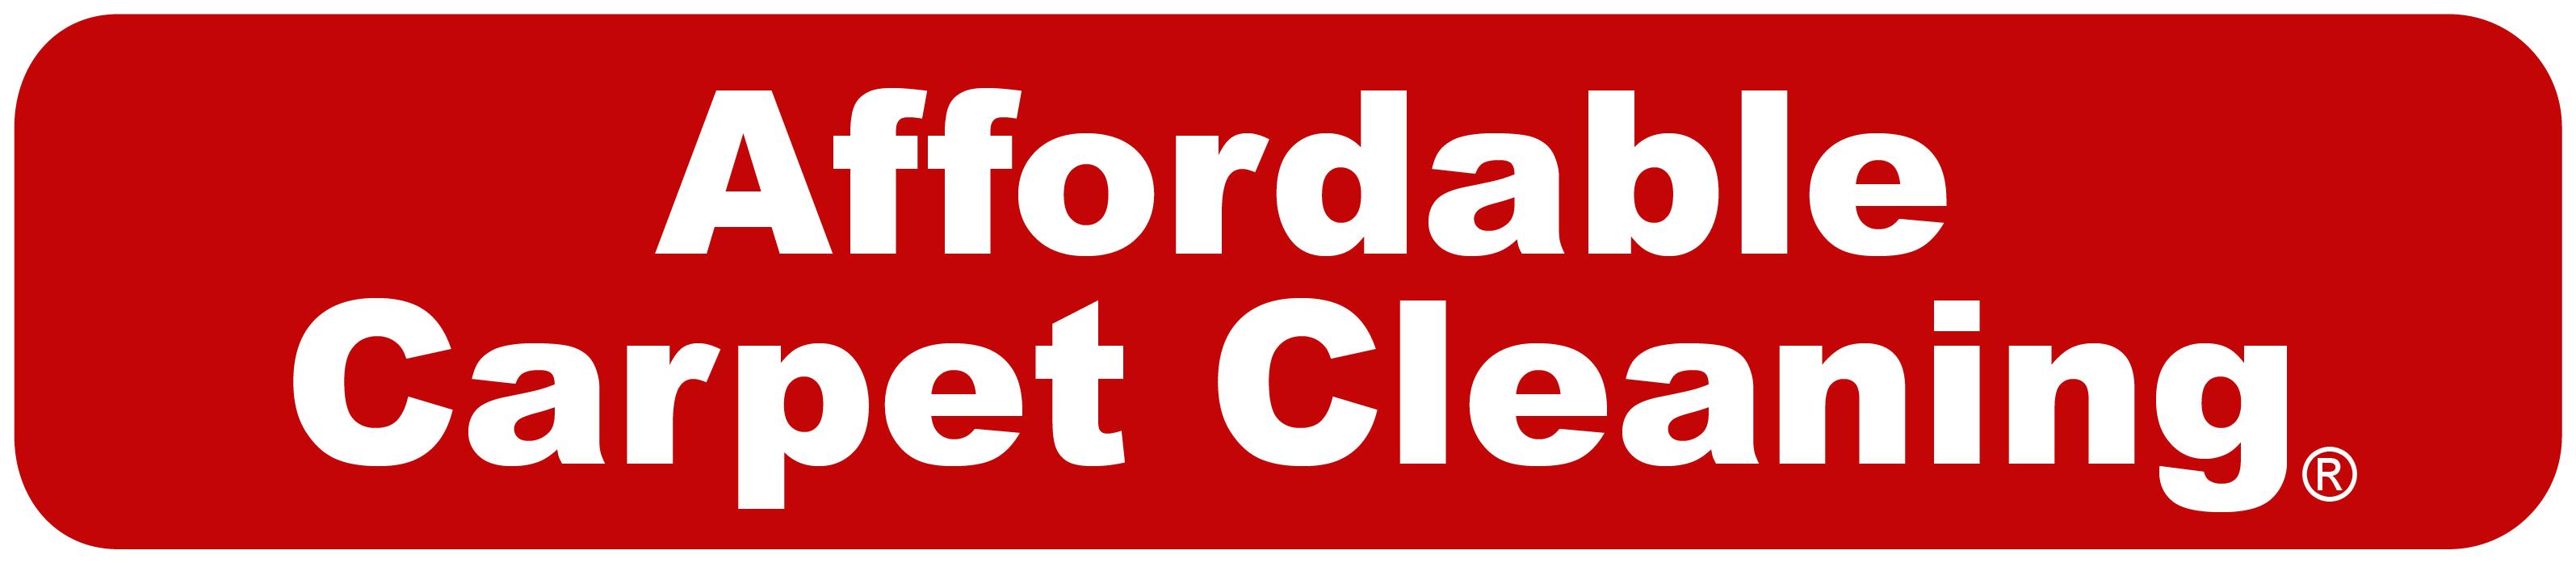 Affordable Carpet Cleaning Naples Fl